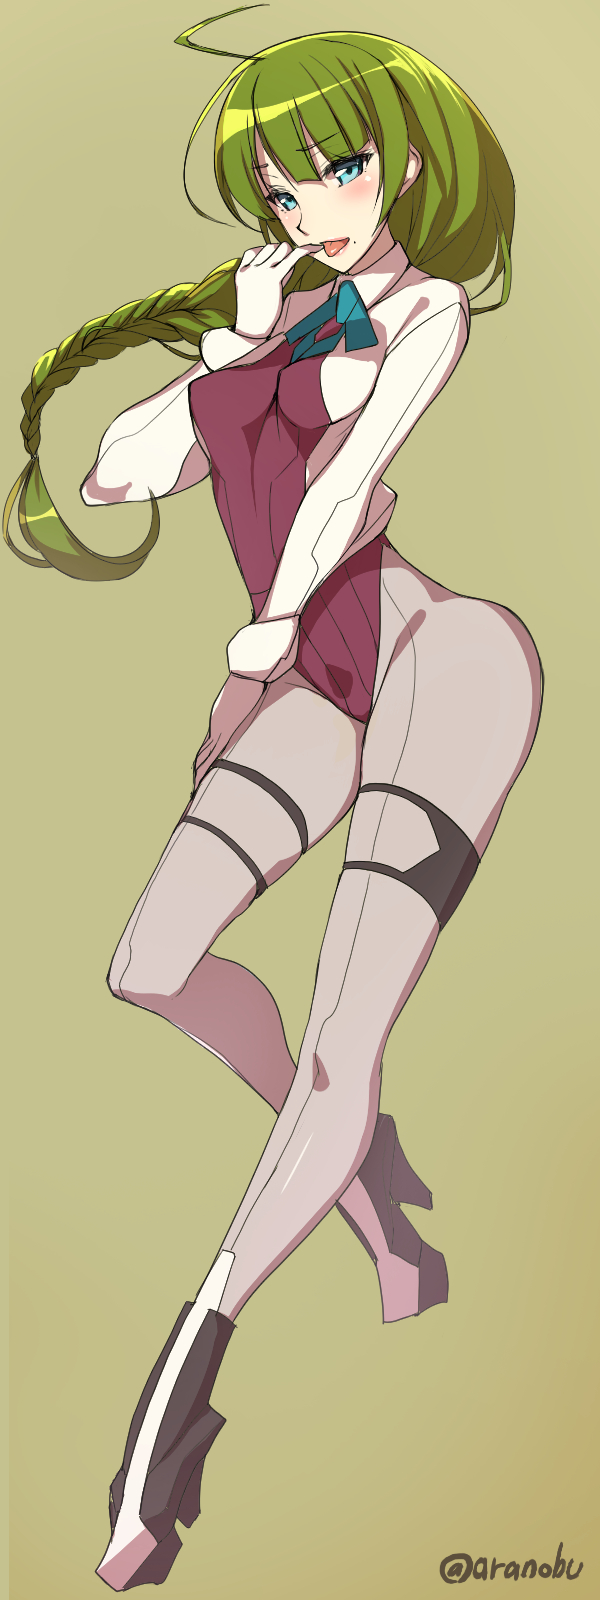 Yuri-chan, The Disgraced Idol _yuugu11